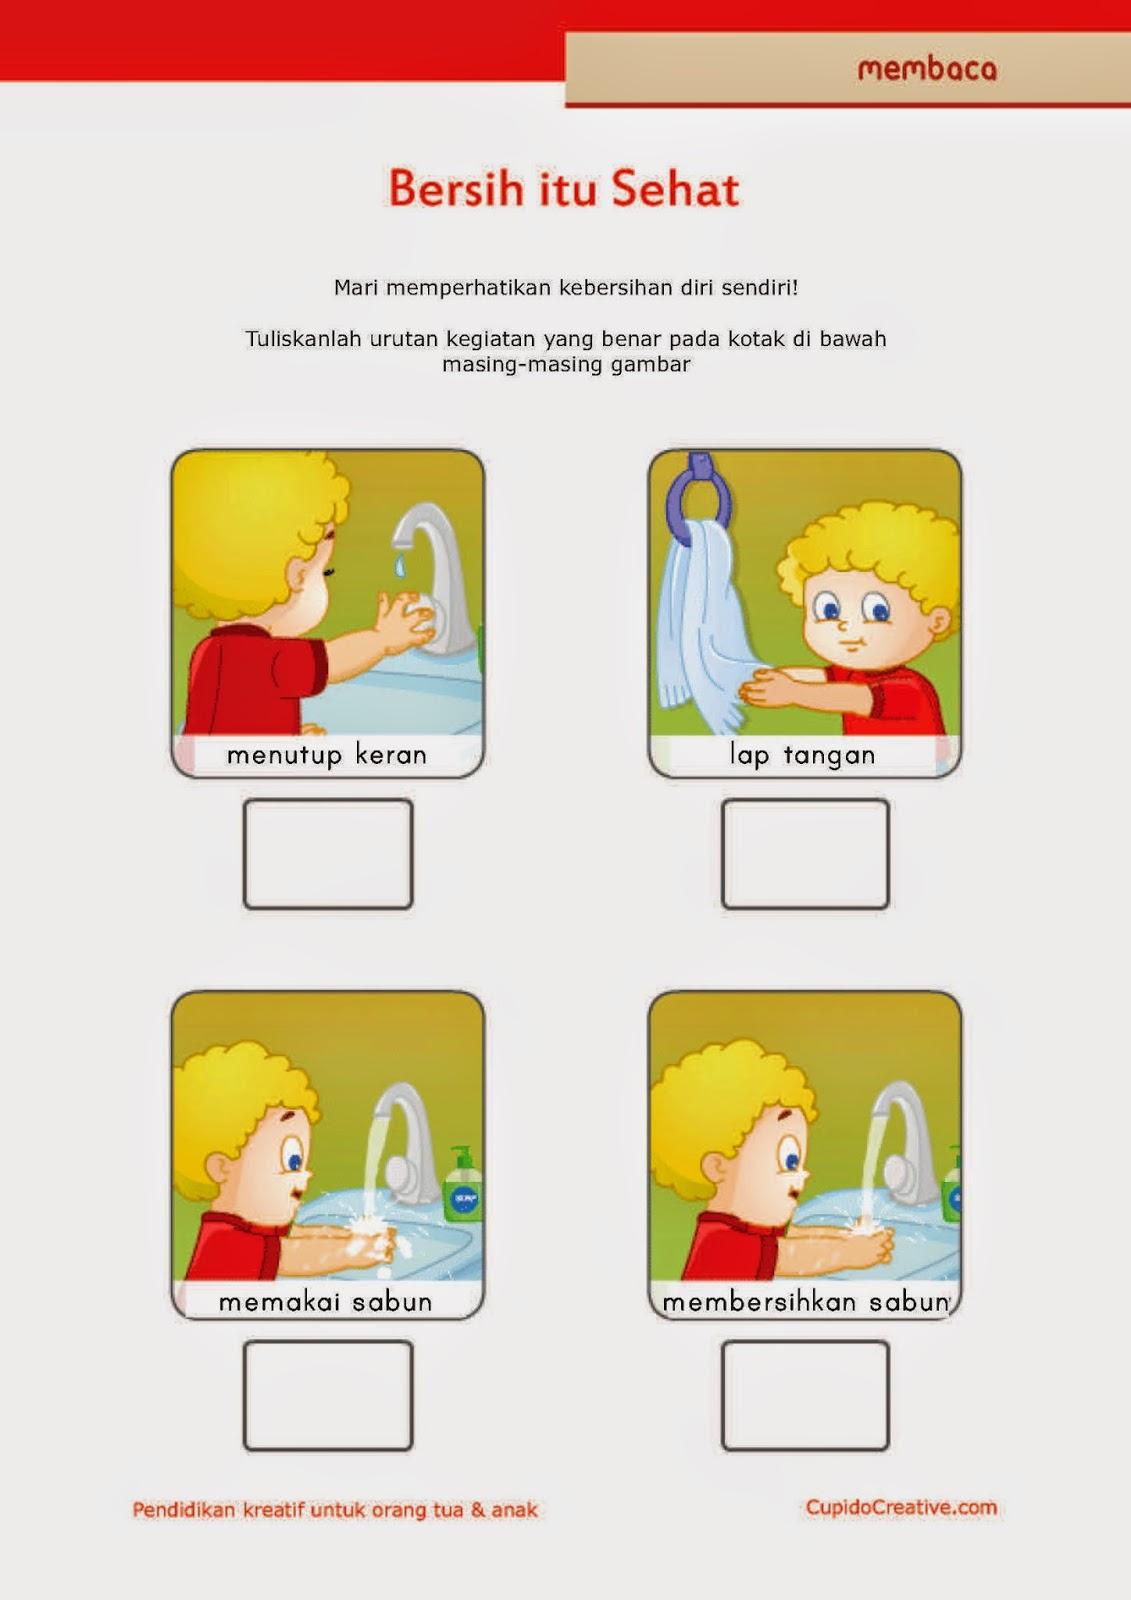 Worksheet Matematika Tk Printable Worksheets And Activities For Teachers Parents Tutors And Homeschool Families